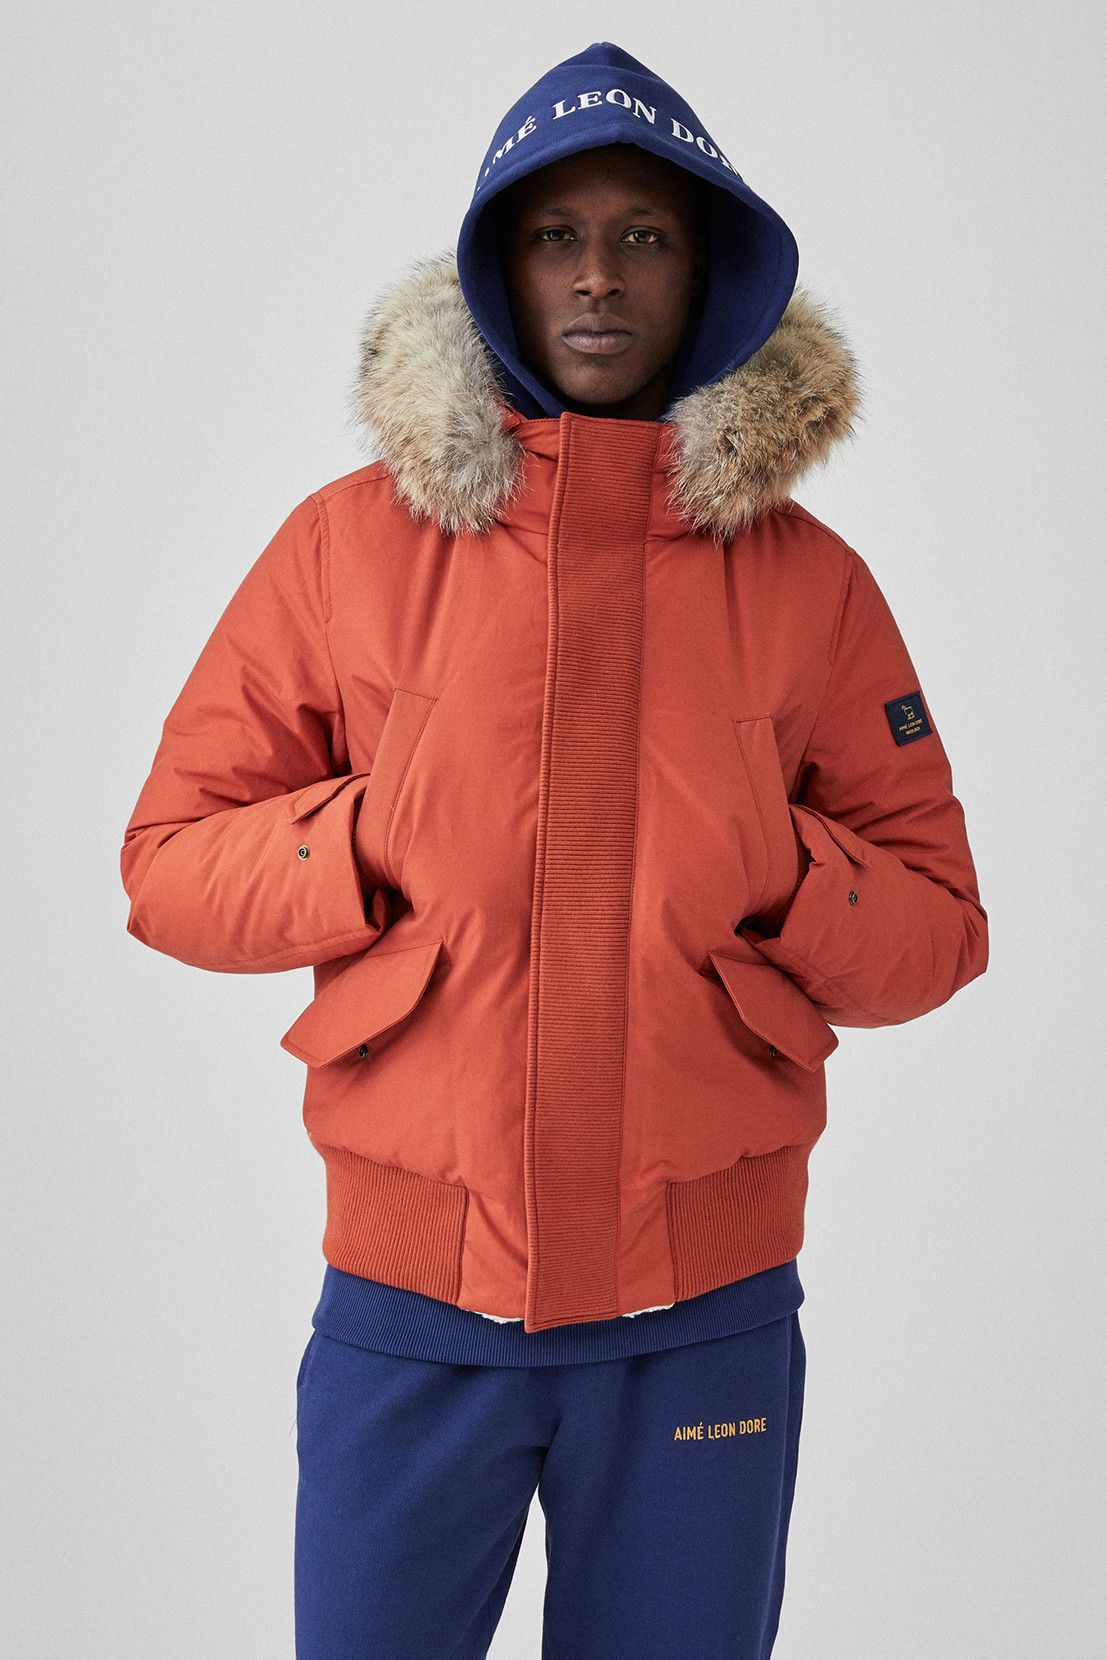 655e89131b6c8 Aimé Leon Dore s FW18 Adds Technical Elements to Timeless Streetwear ...